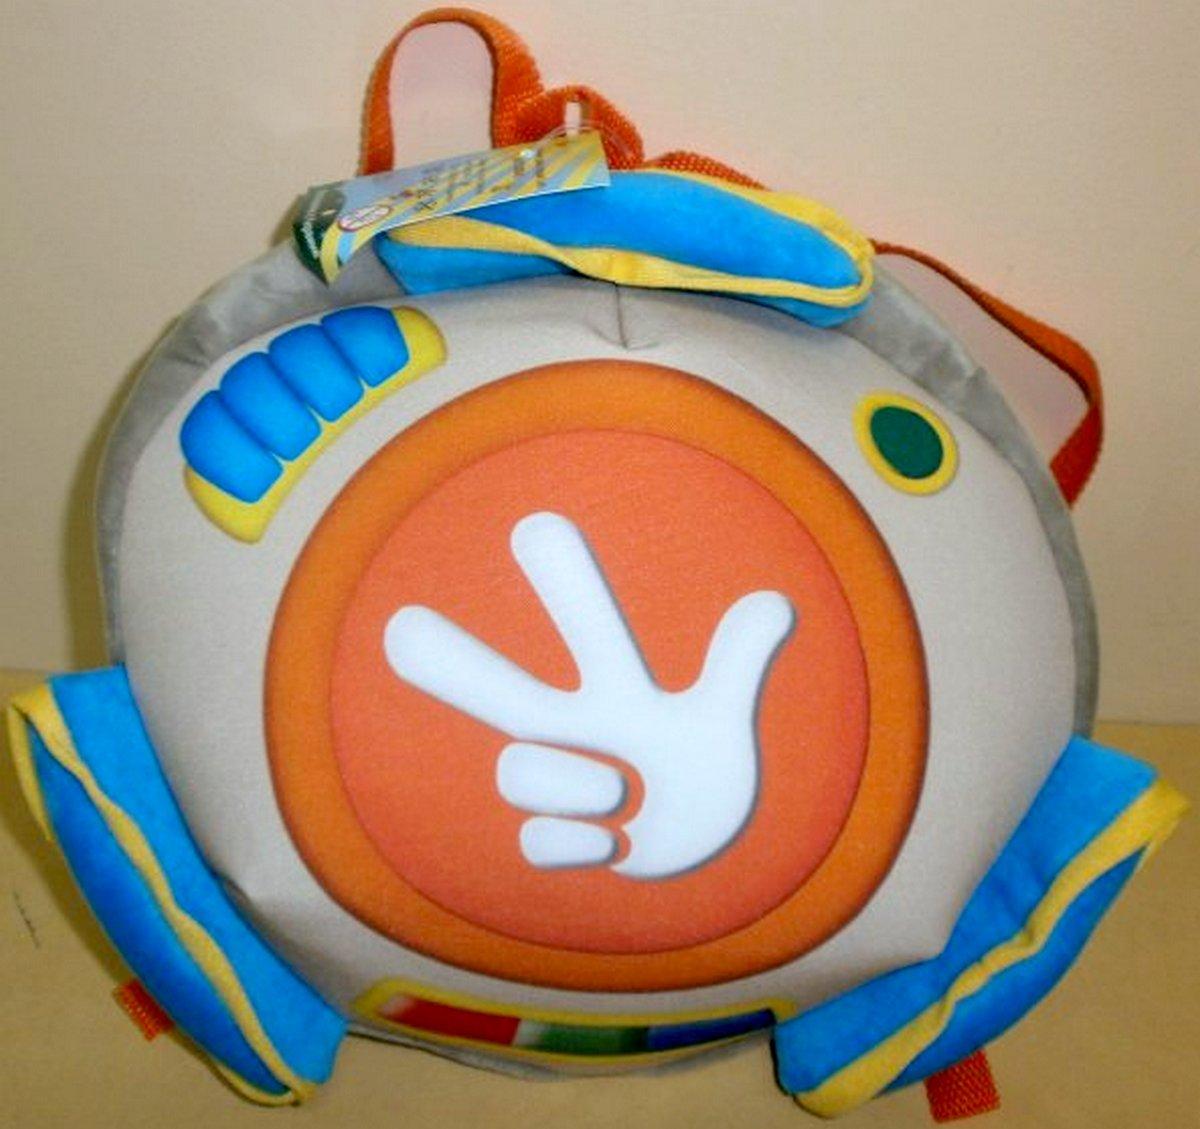 Детский рюкзак помогатор купить 02003002-11 рюкзак детский